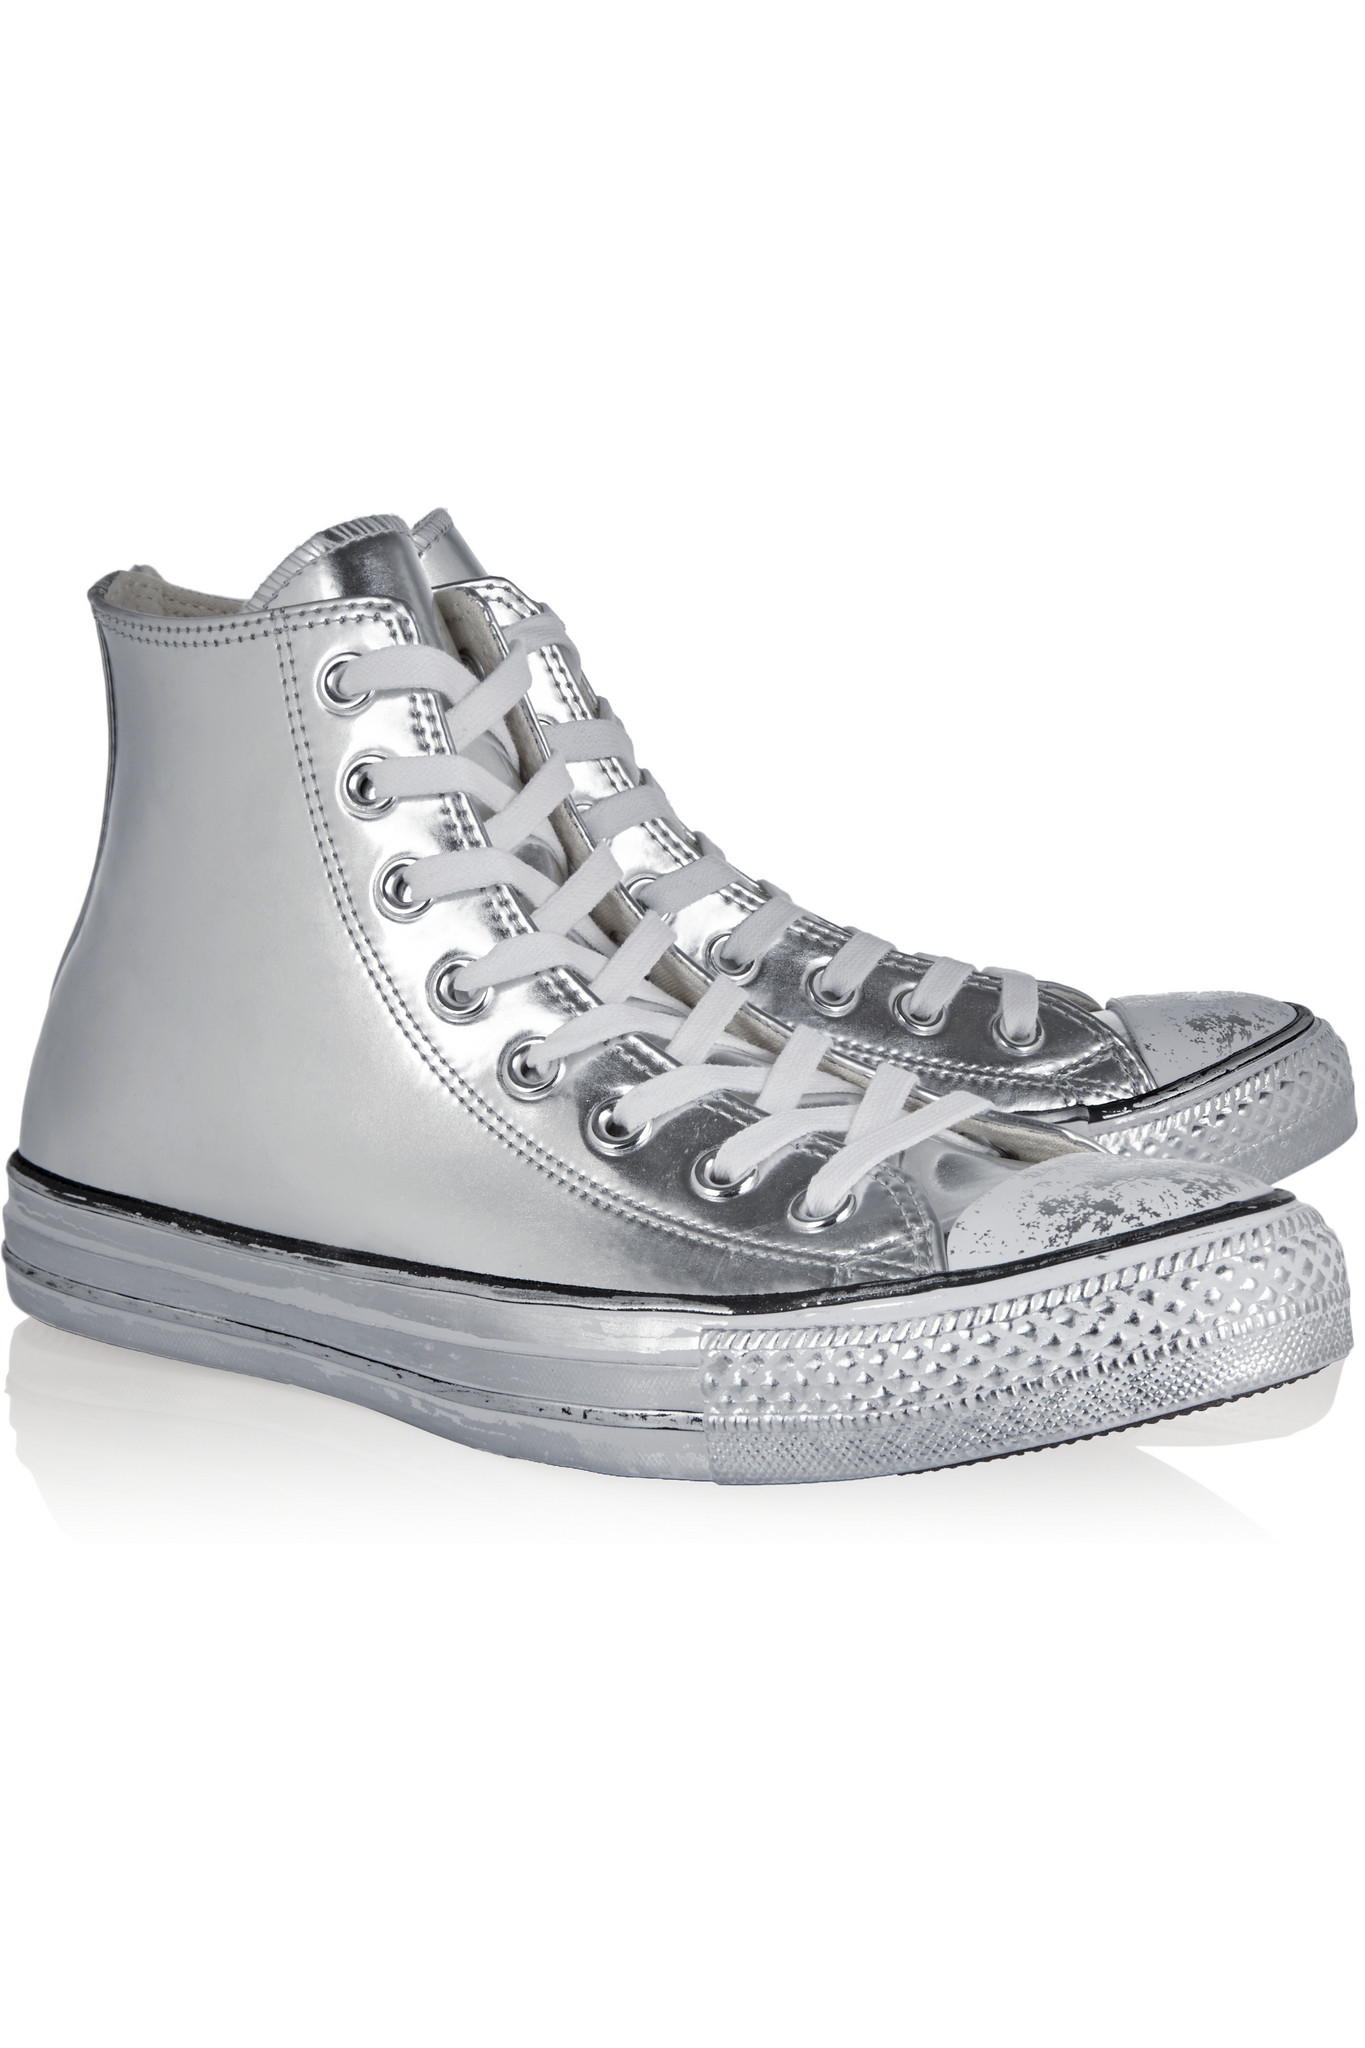 ee9b353e9a7775 Converse Chuck Taylor All Star Chrome Metallic Leather High-top ...